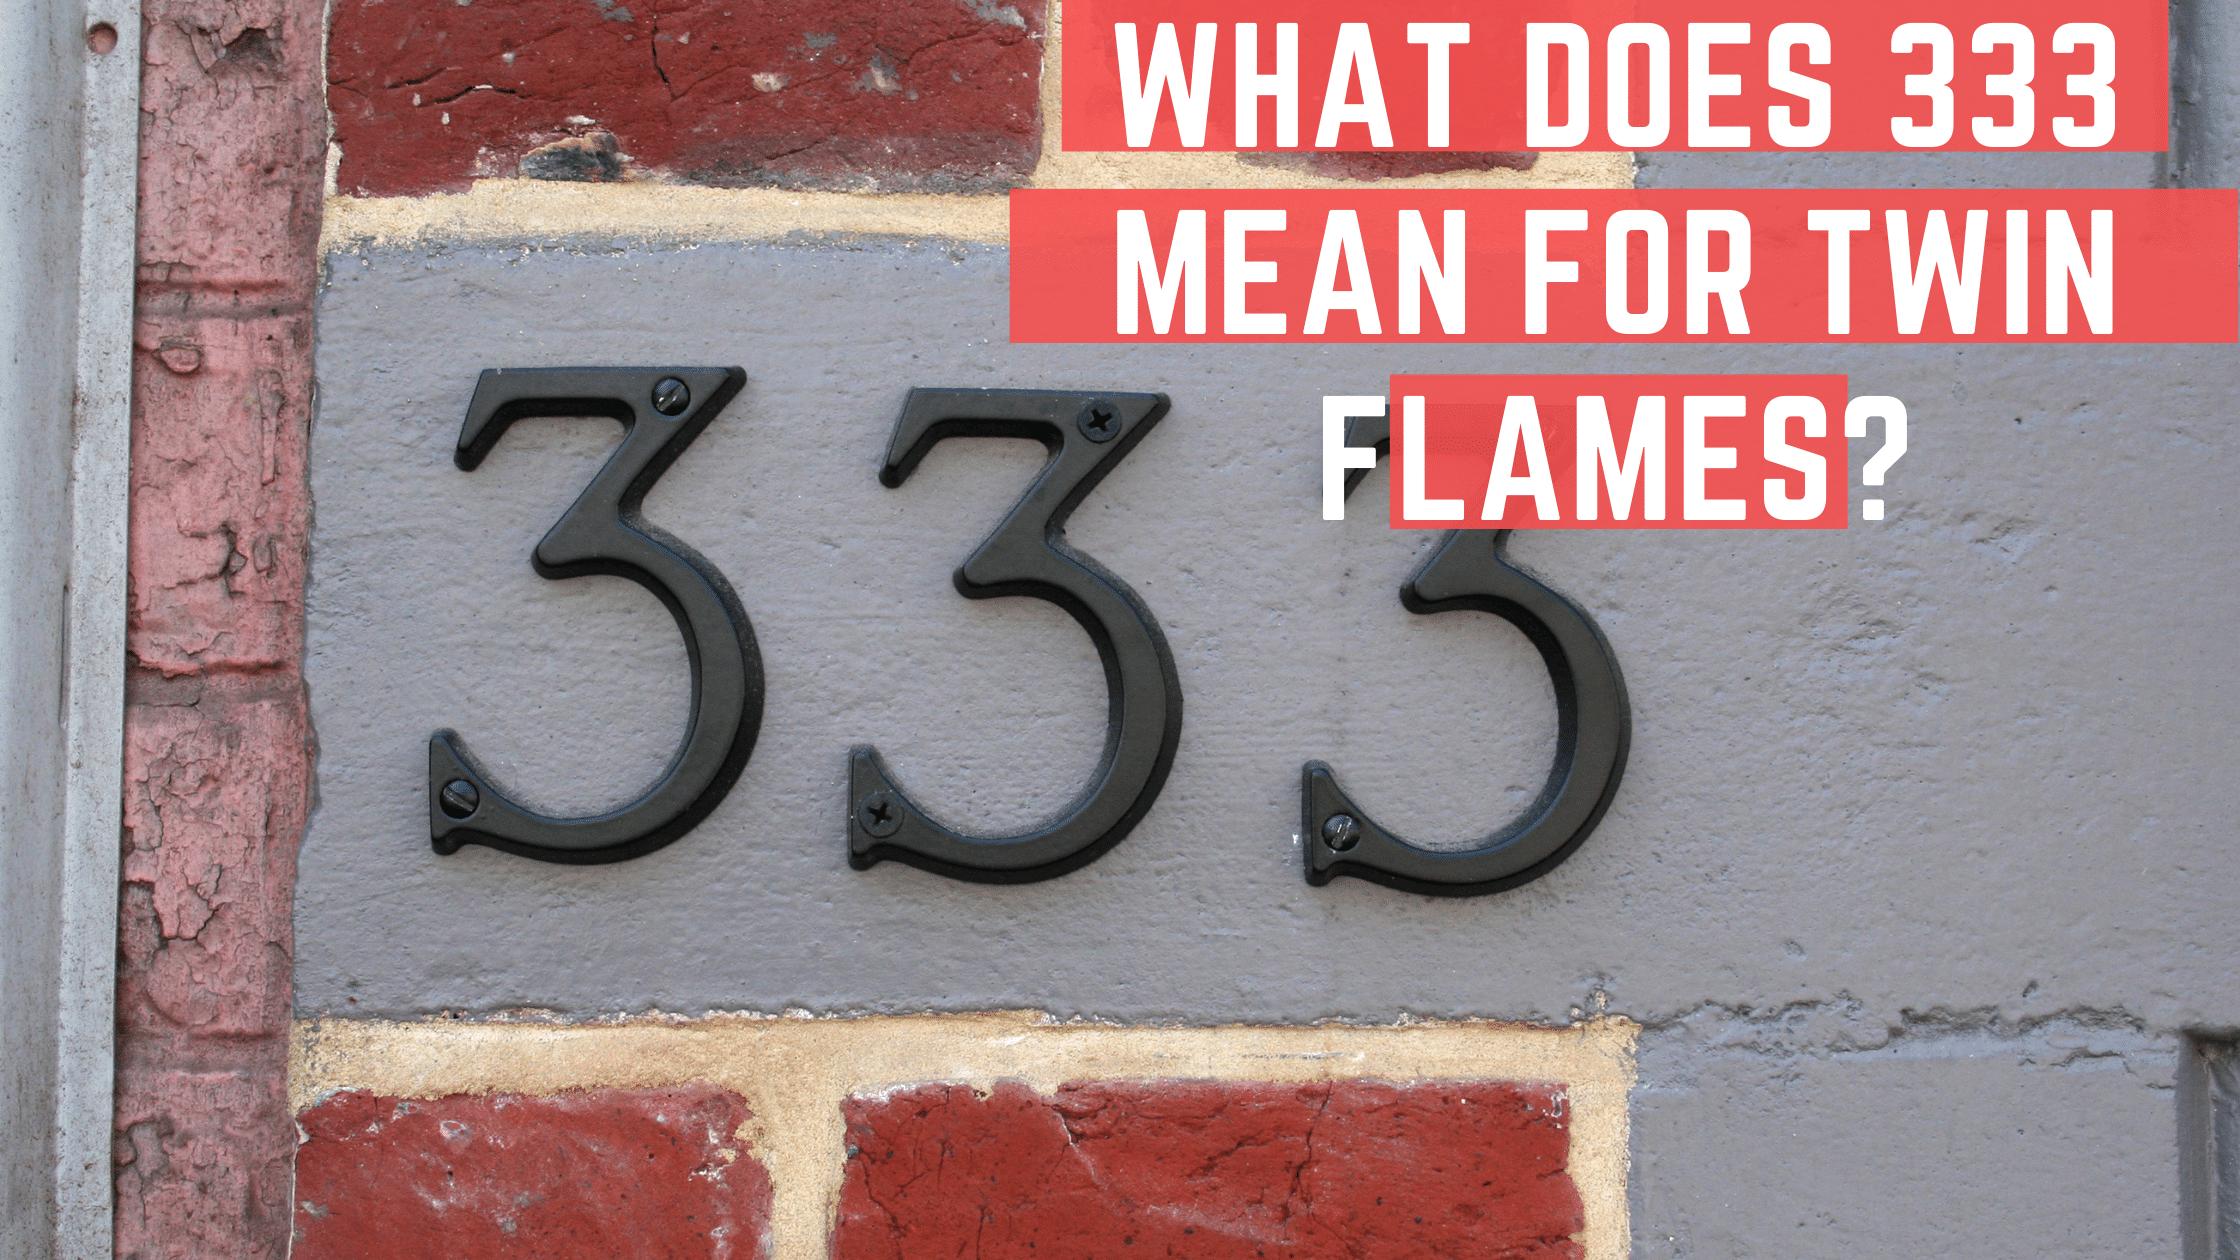 333 twin flames